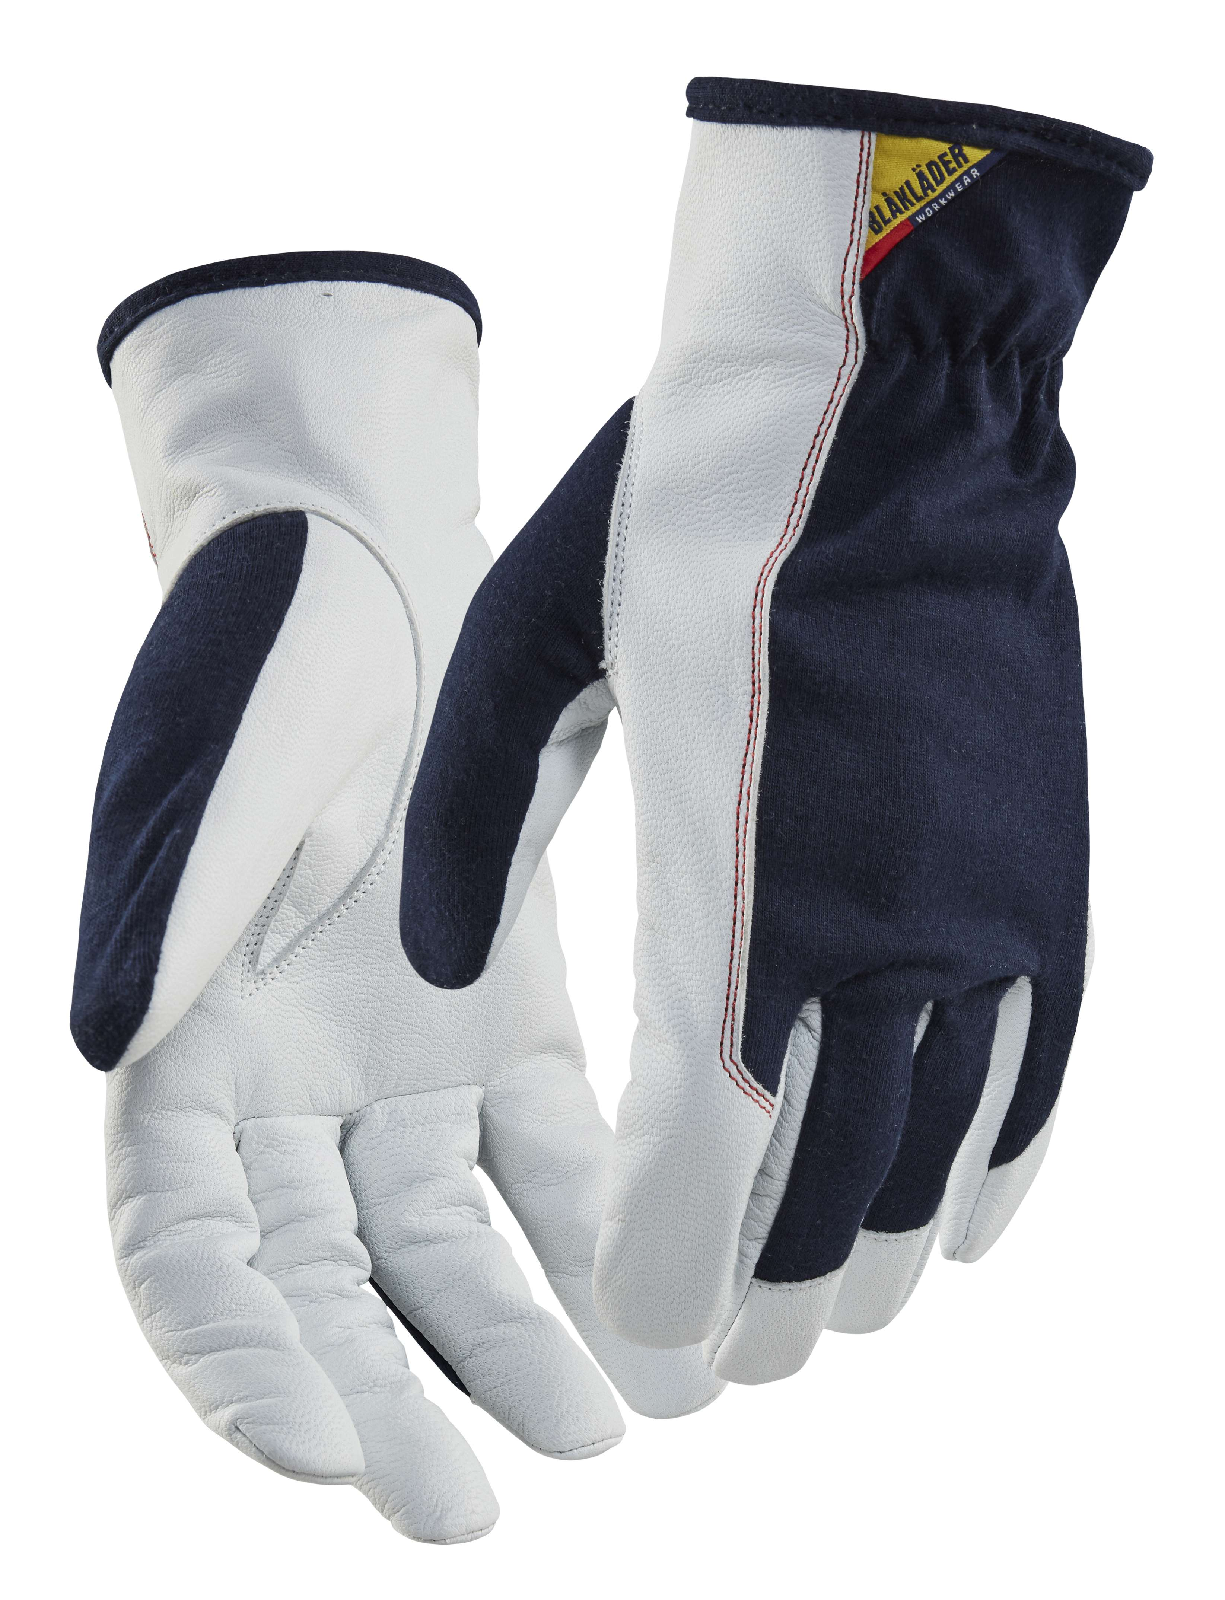 Blaklader Handschoenen 28031458 donker marineblauw-wit(8610)